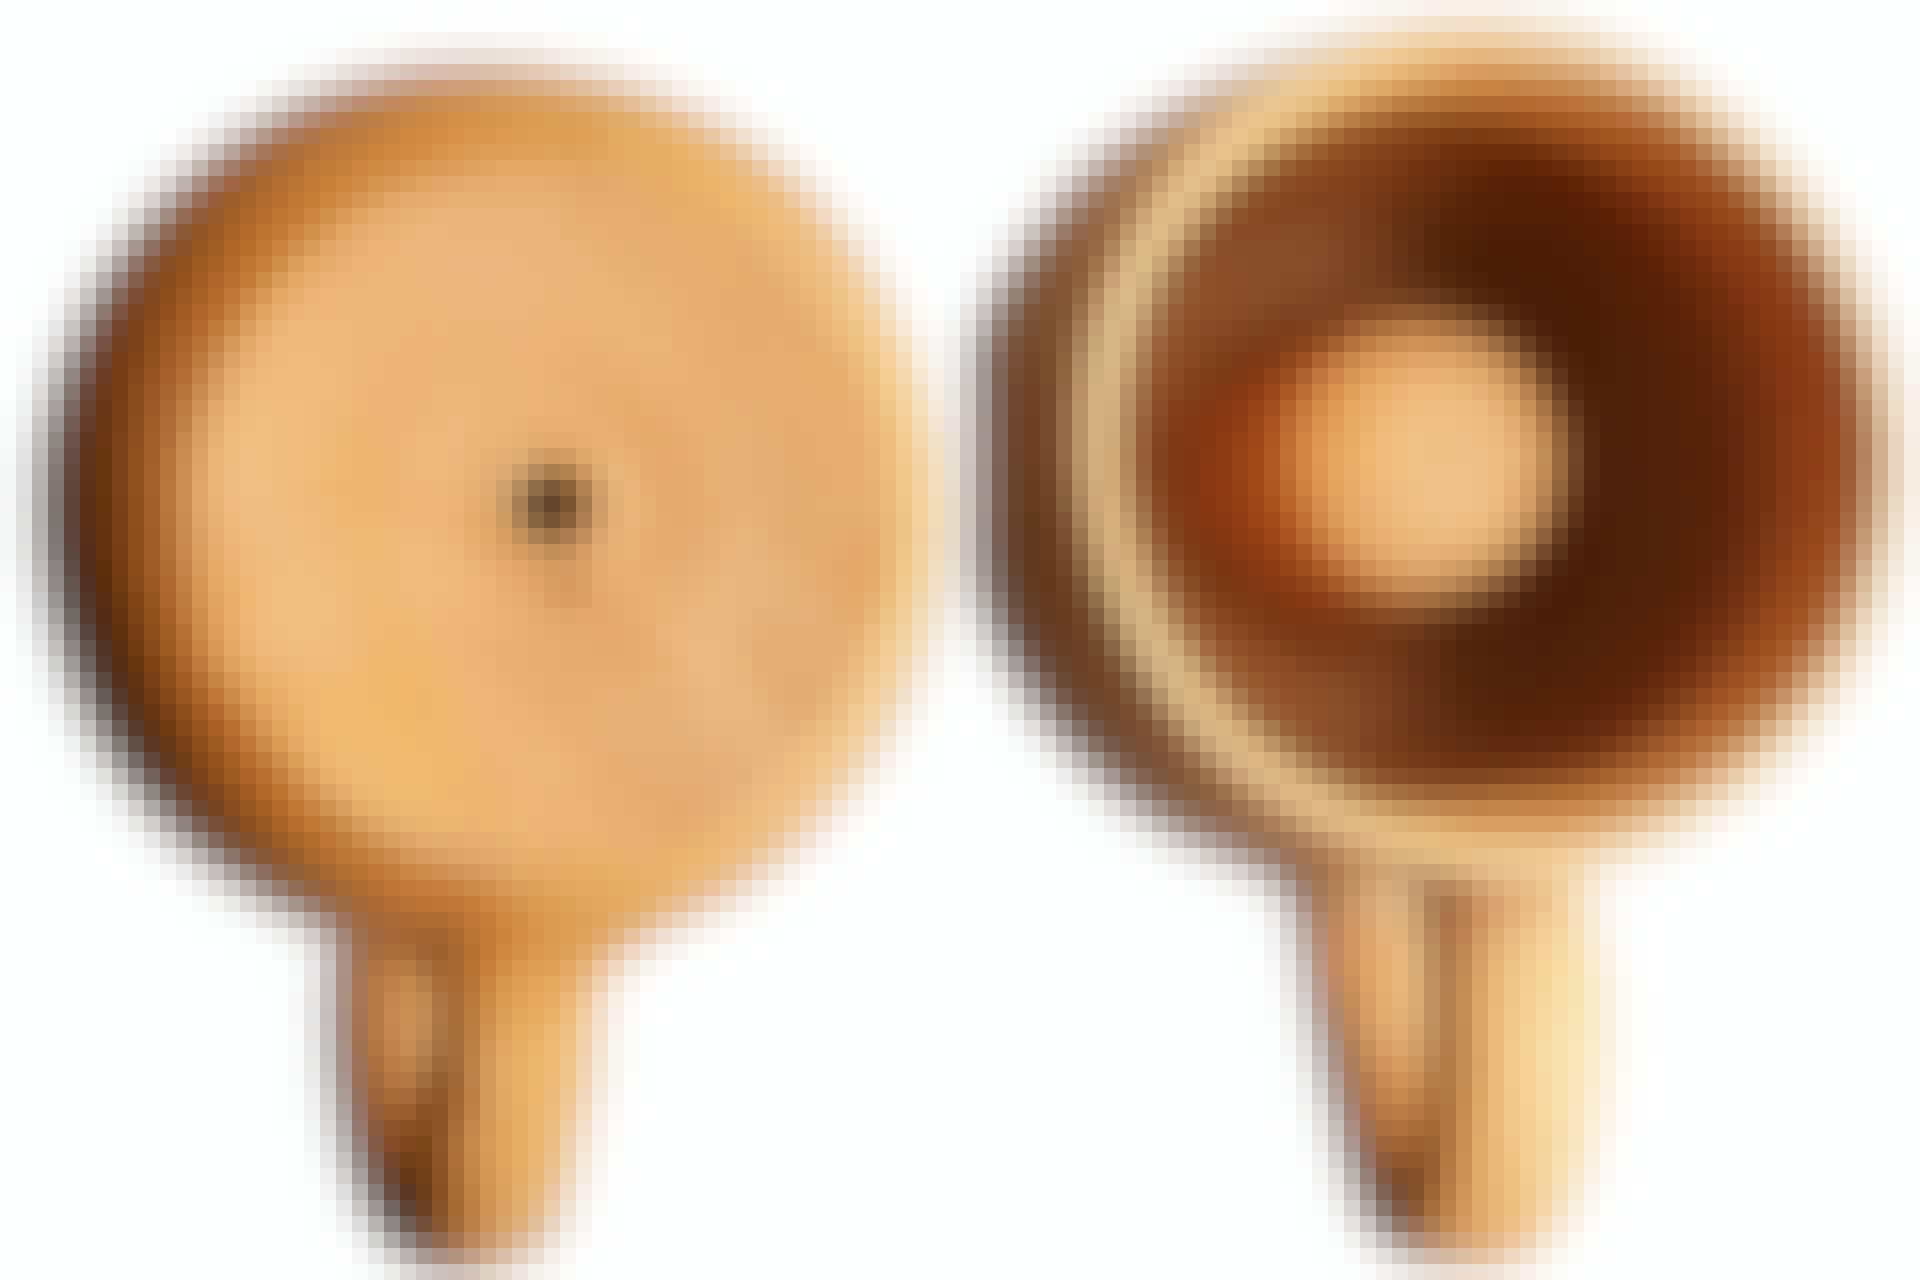 Pythagoras' cup